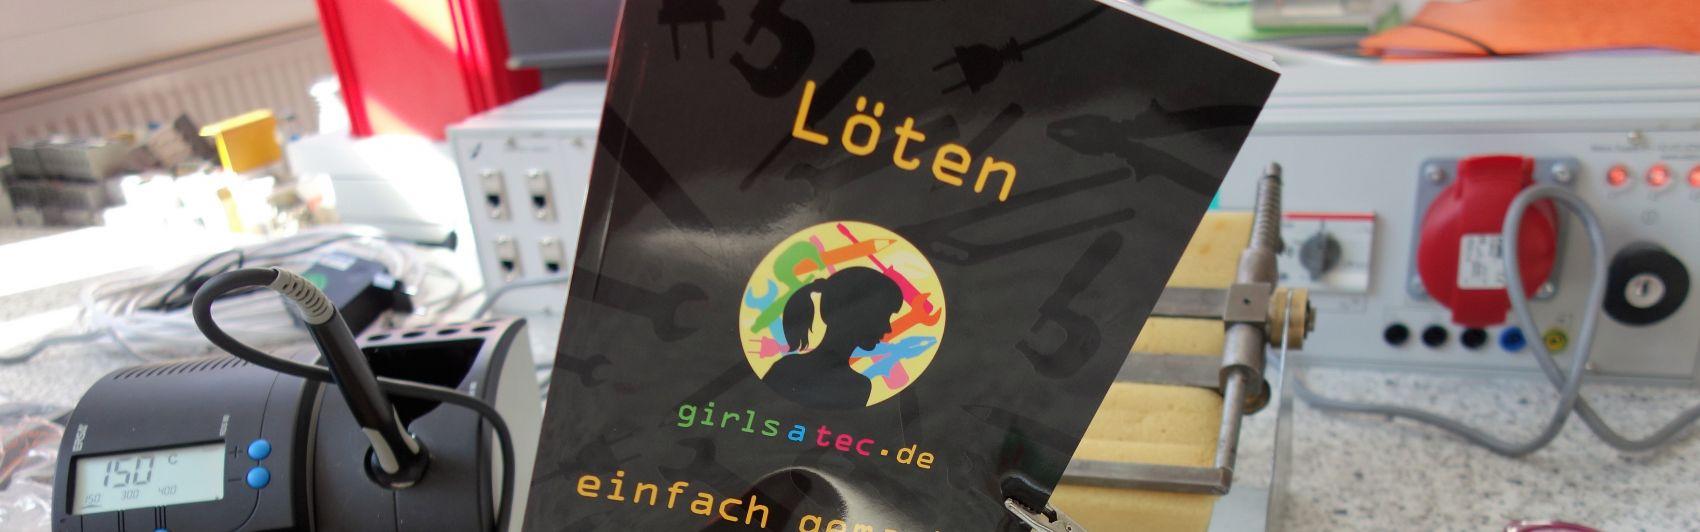 girlsatec Loetanleitung